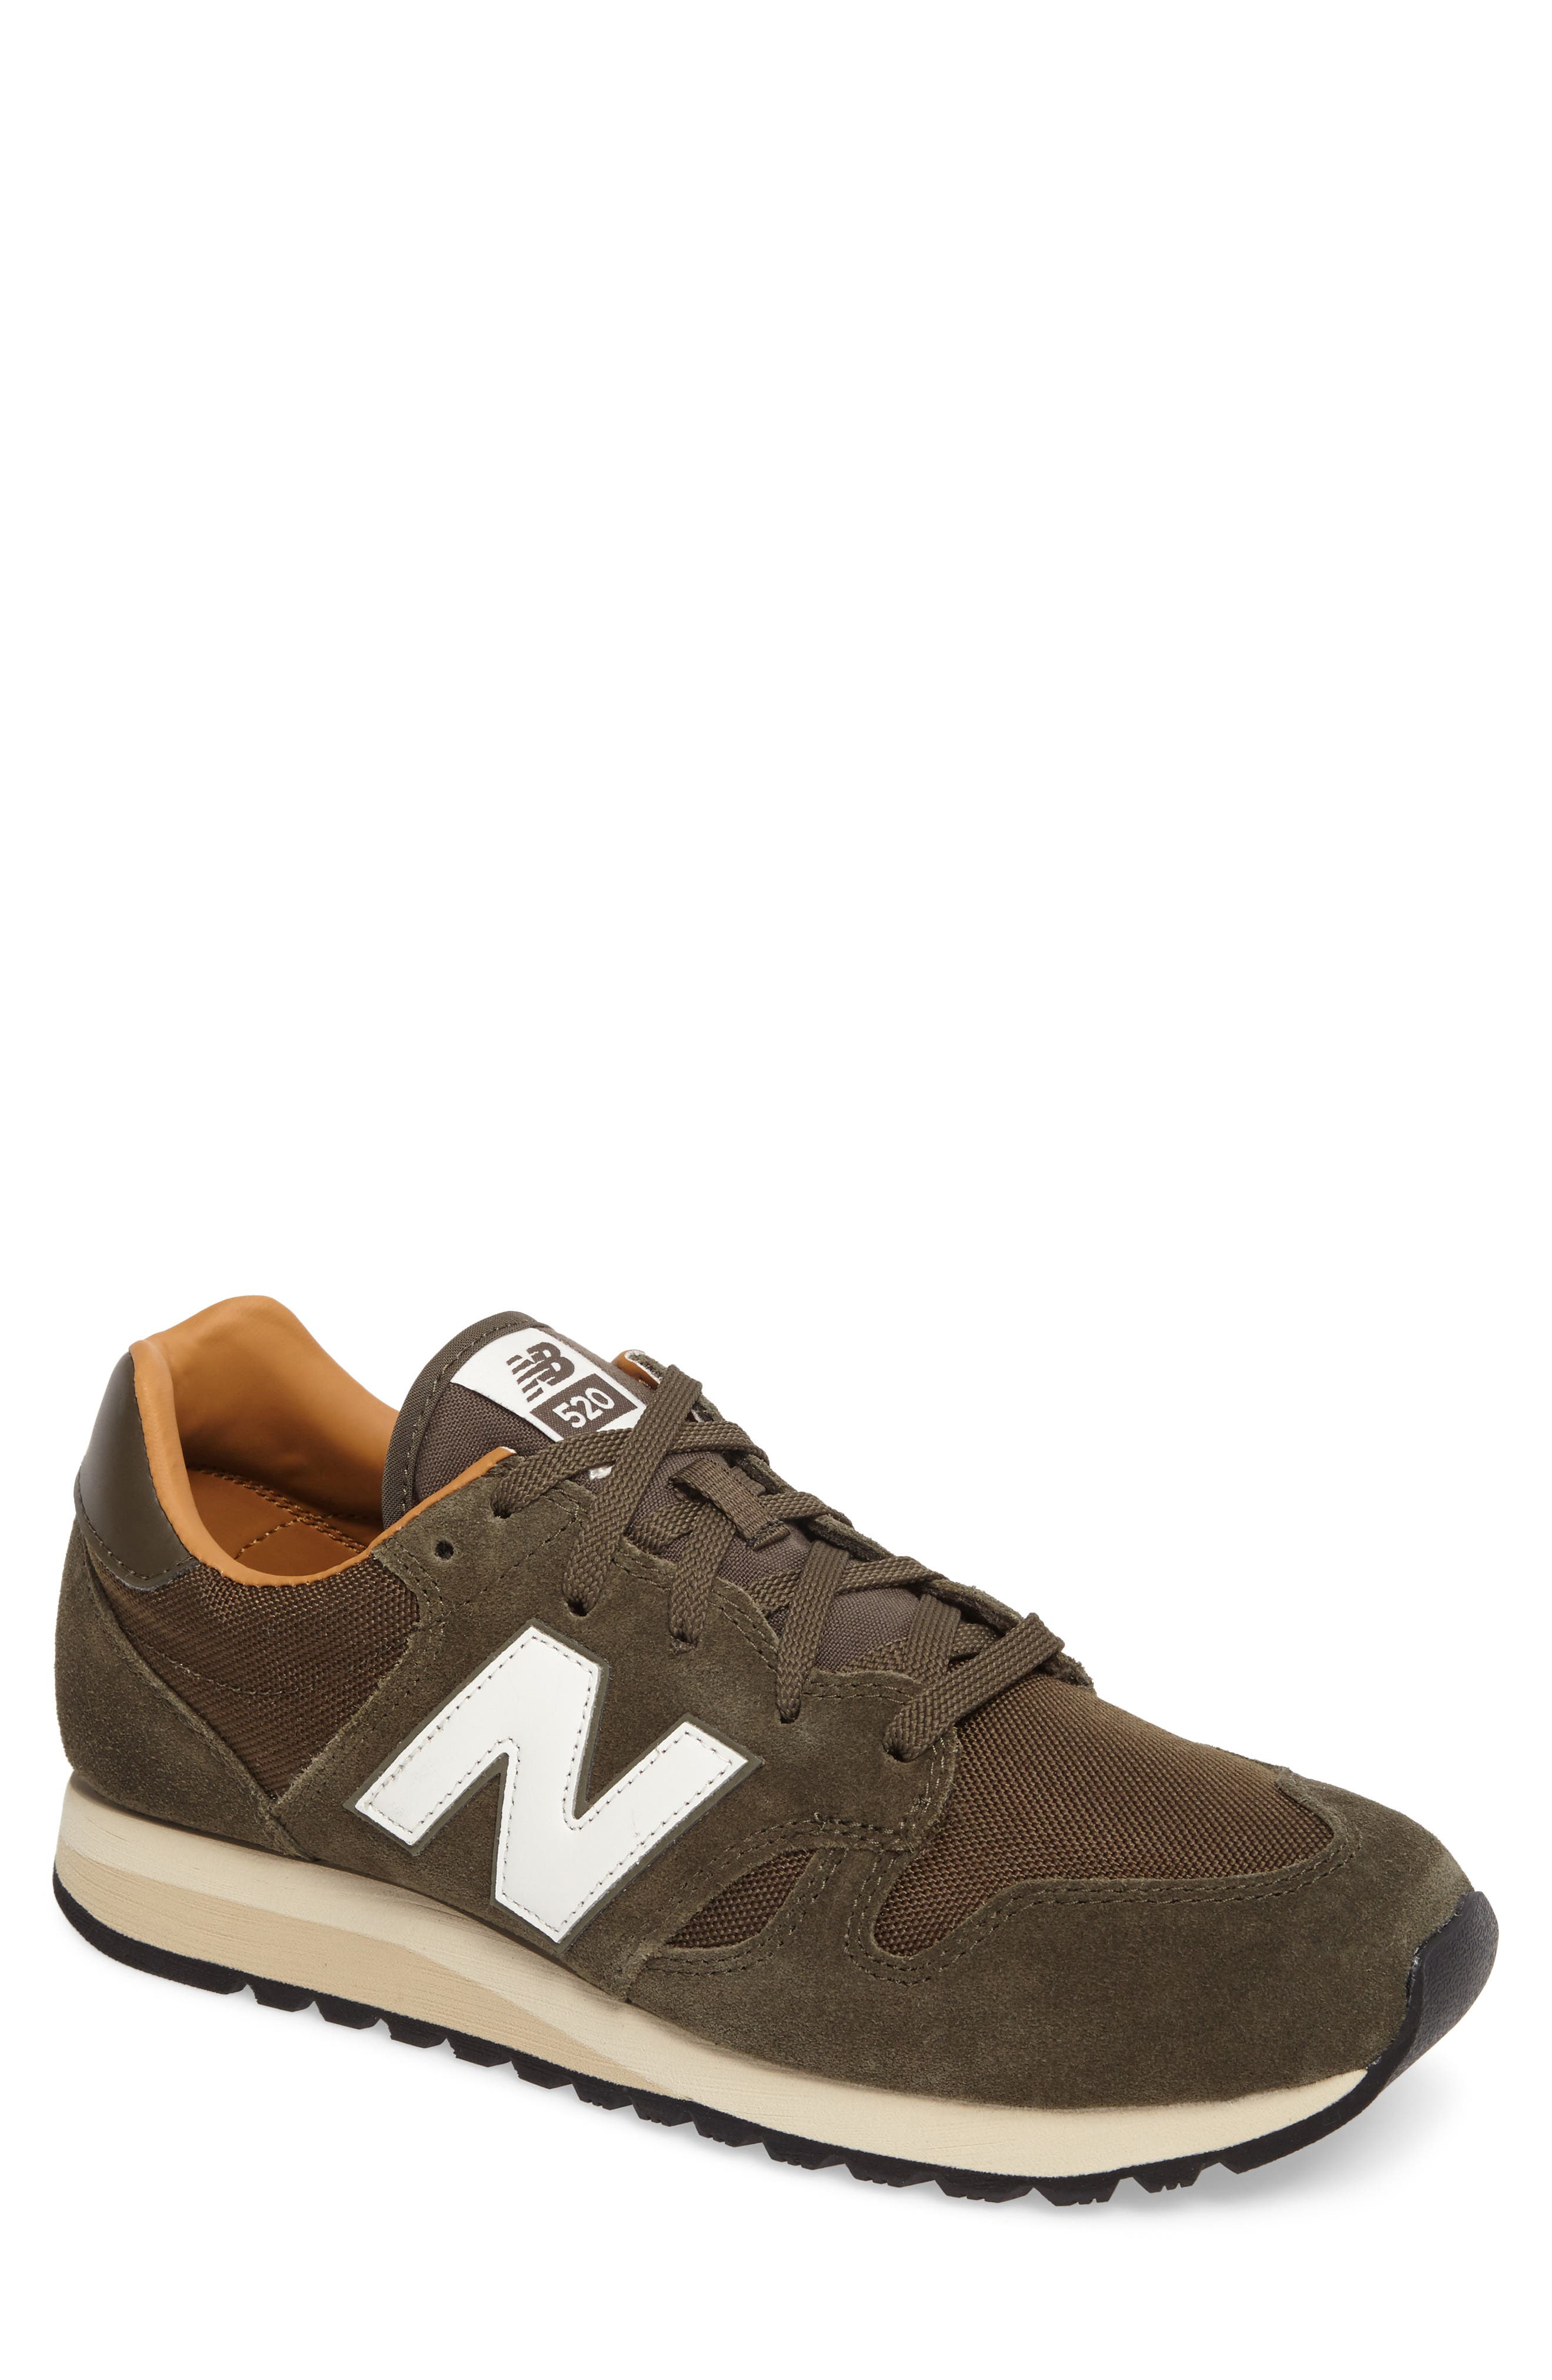 New Balance 520 Sneaker (Men)